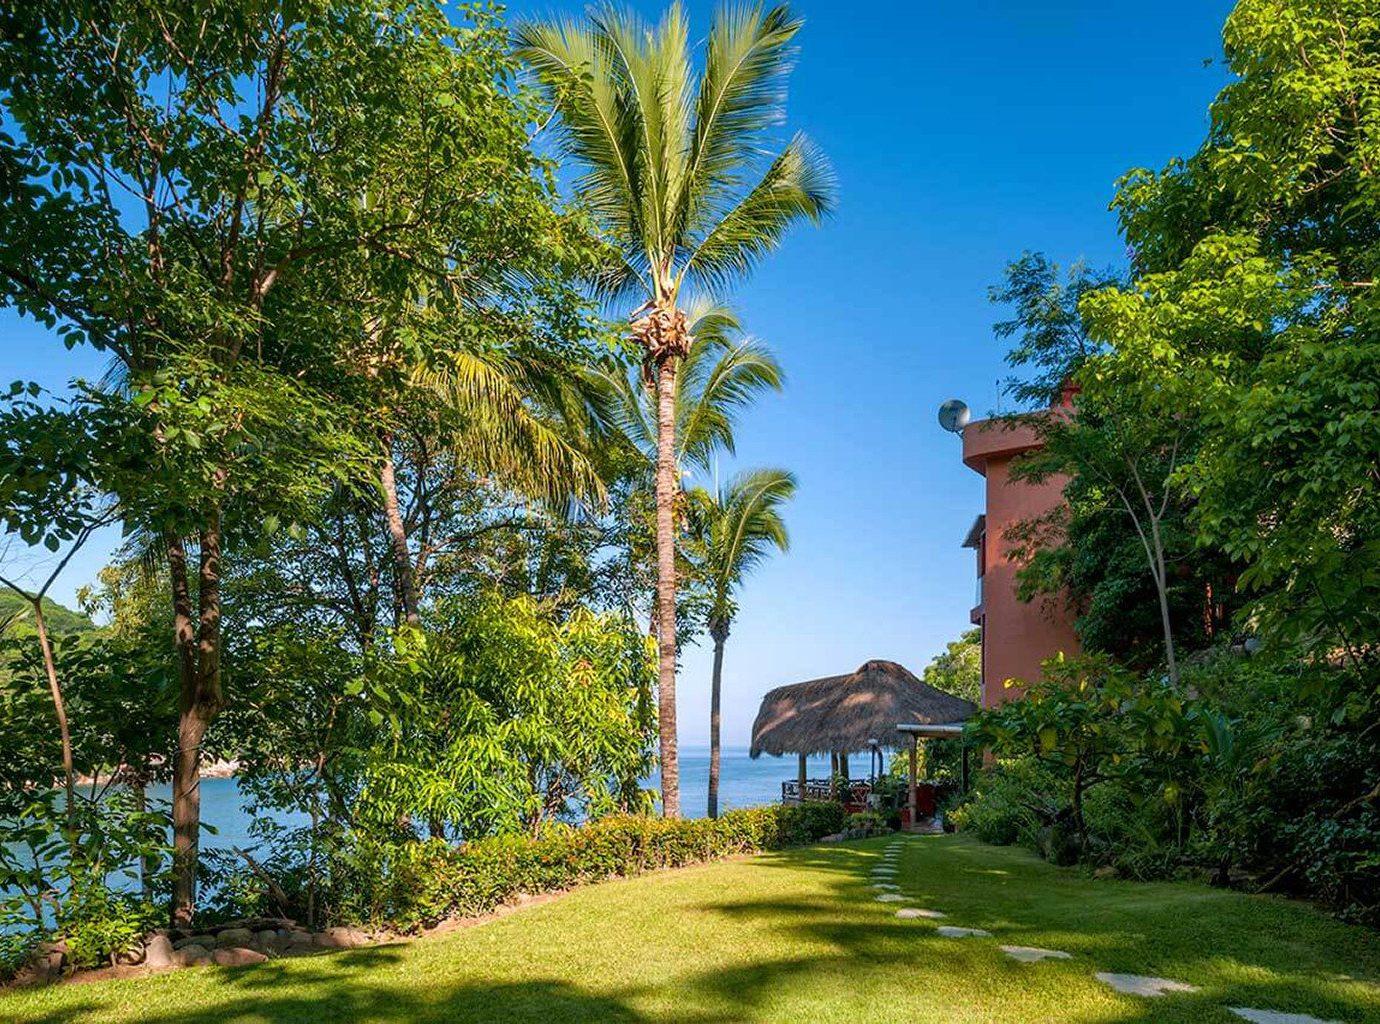 tree grass plant arecales woody plant Garden Jungle tropics biome plantation Resort mansion botanical garden lush